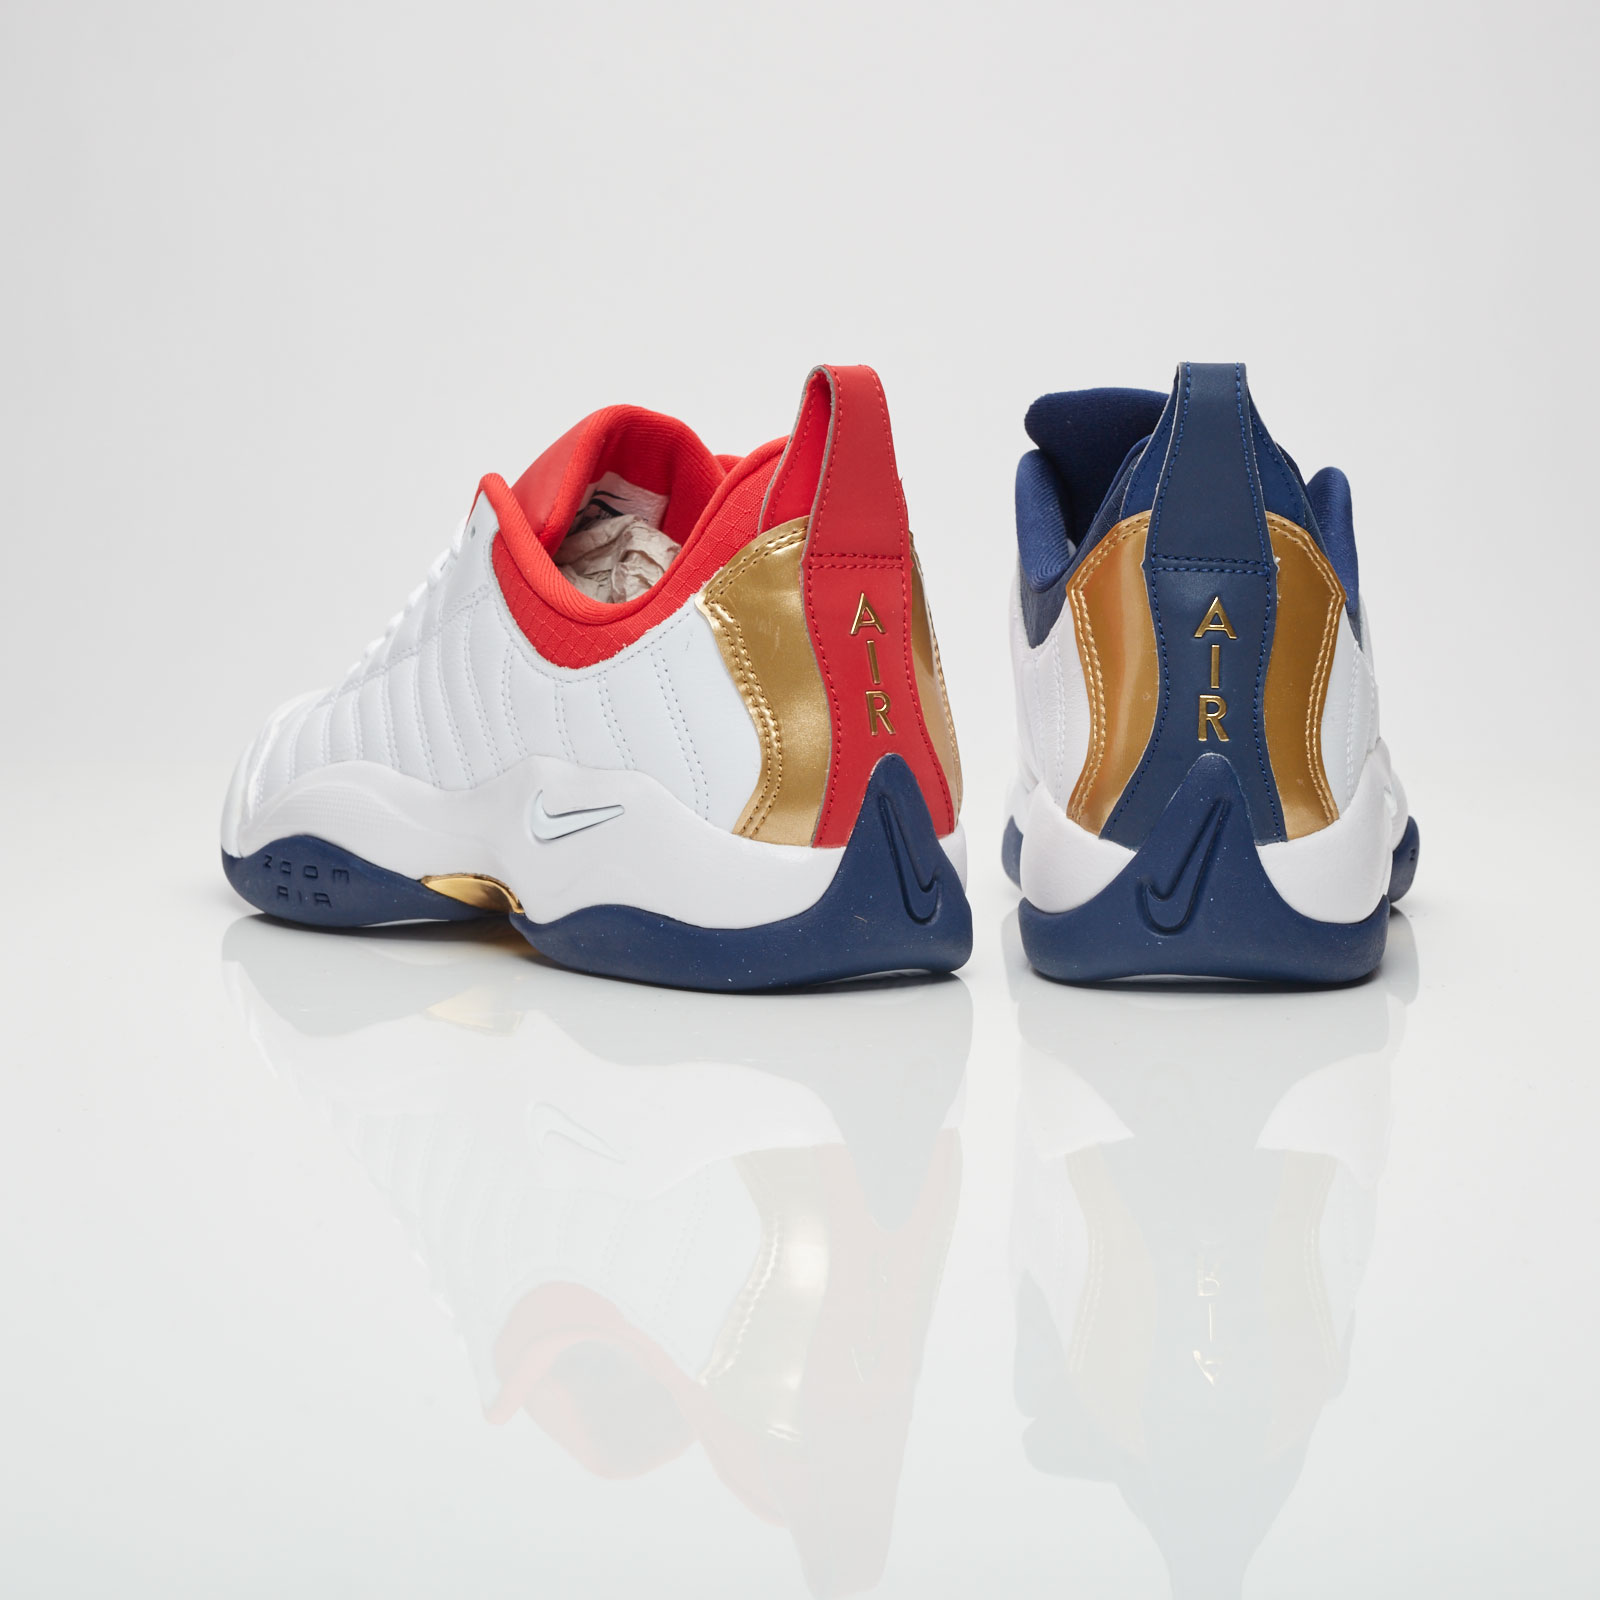 exilio Distraer Grave  Nike Air Oscillate - 140370-106 - Sneakersnstuff | sneakers & streetwear  online since 1999